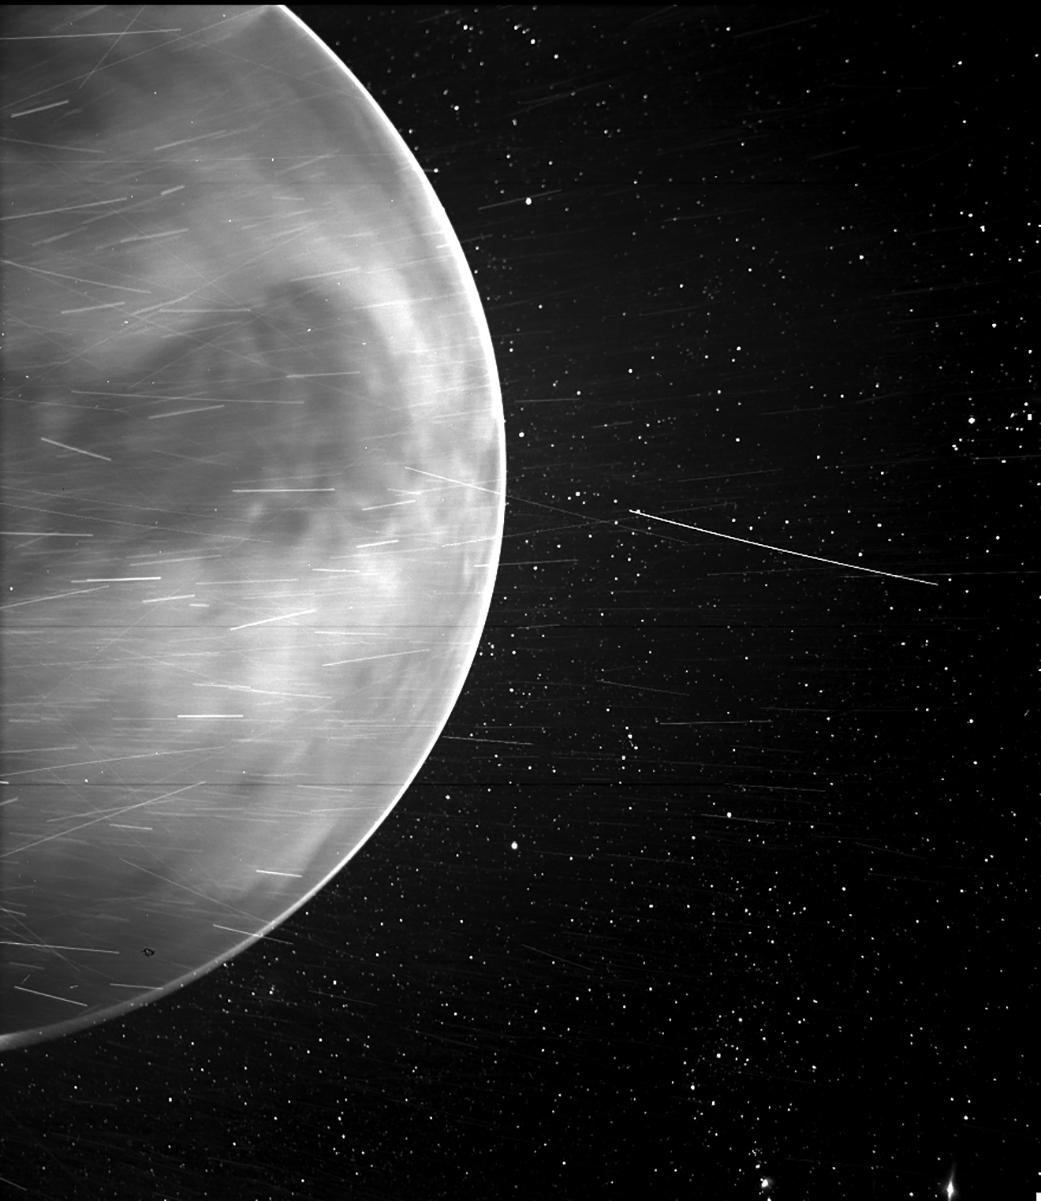 A NASA Probe Detected Natural Radio Emissions from Venus